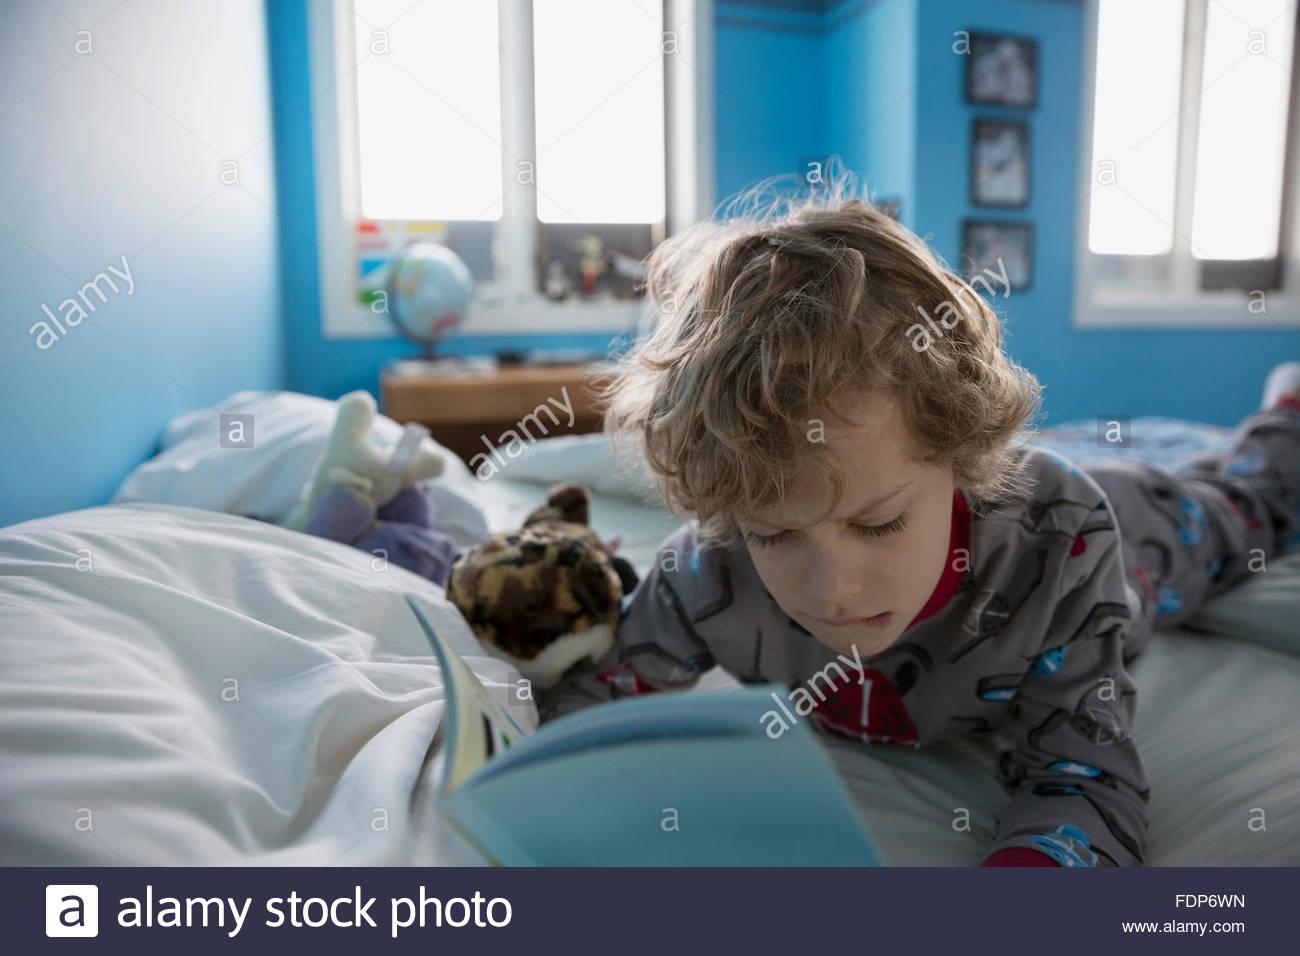 Junge im Pyjama Buch auf Bett Stockbild